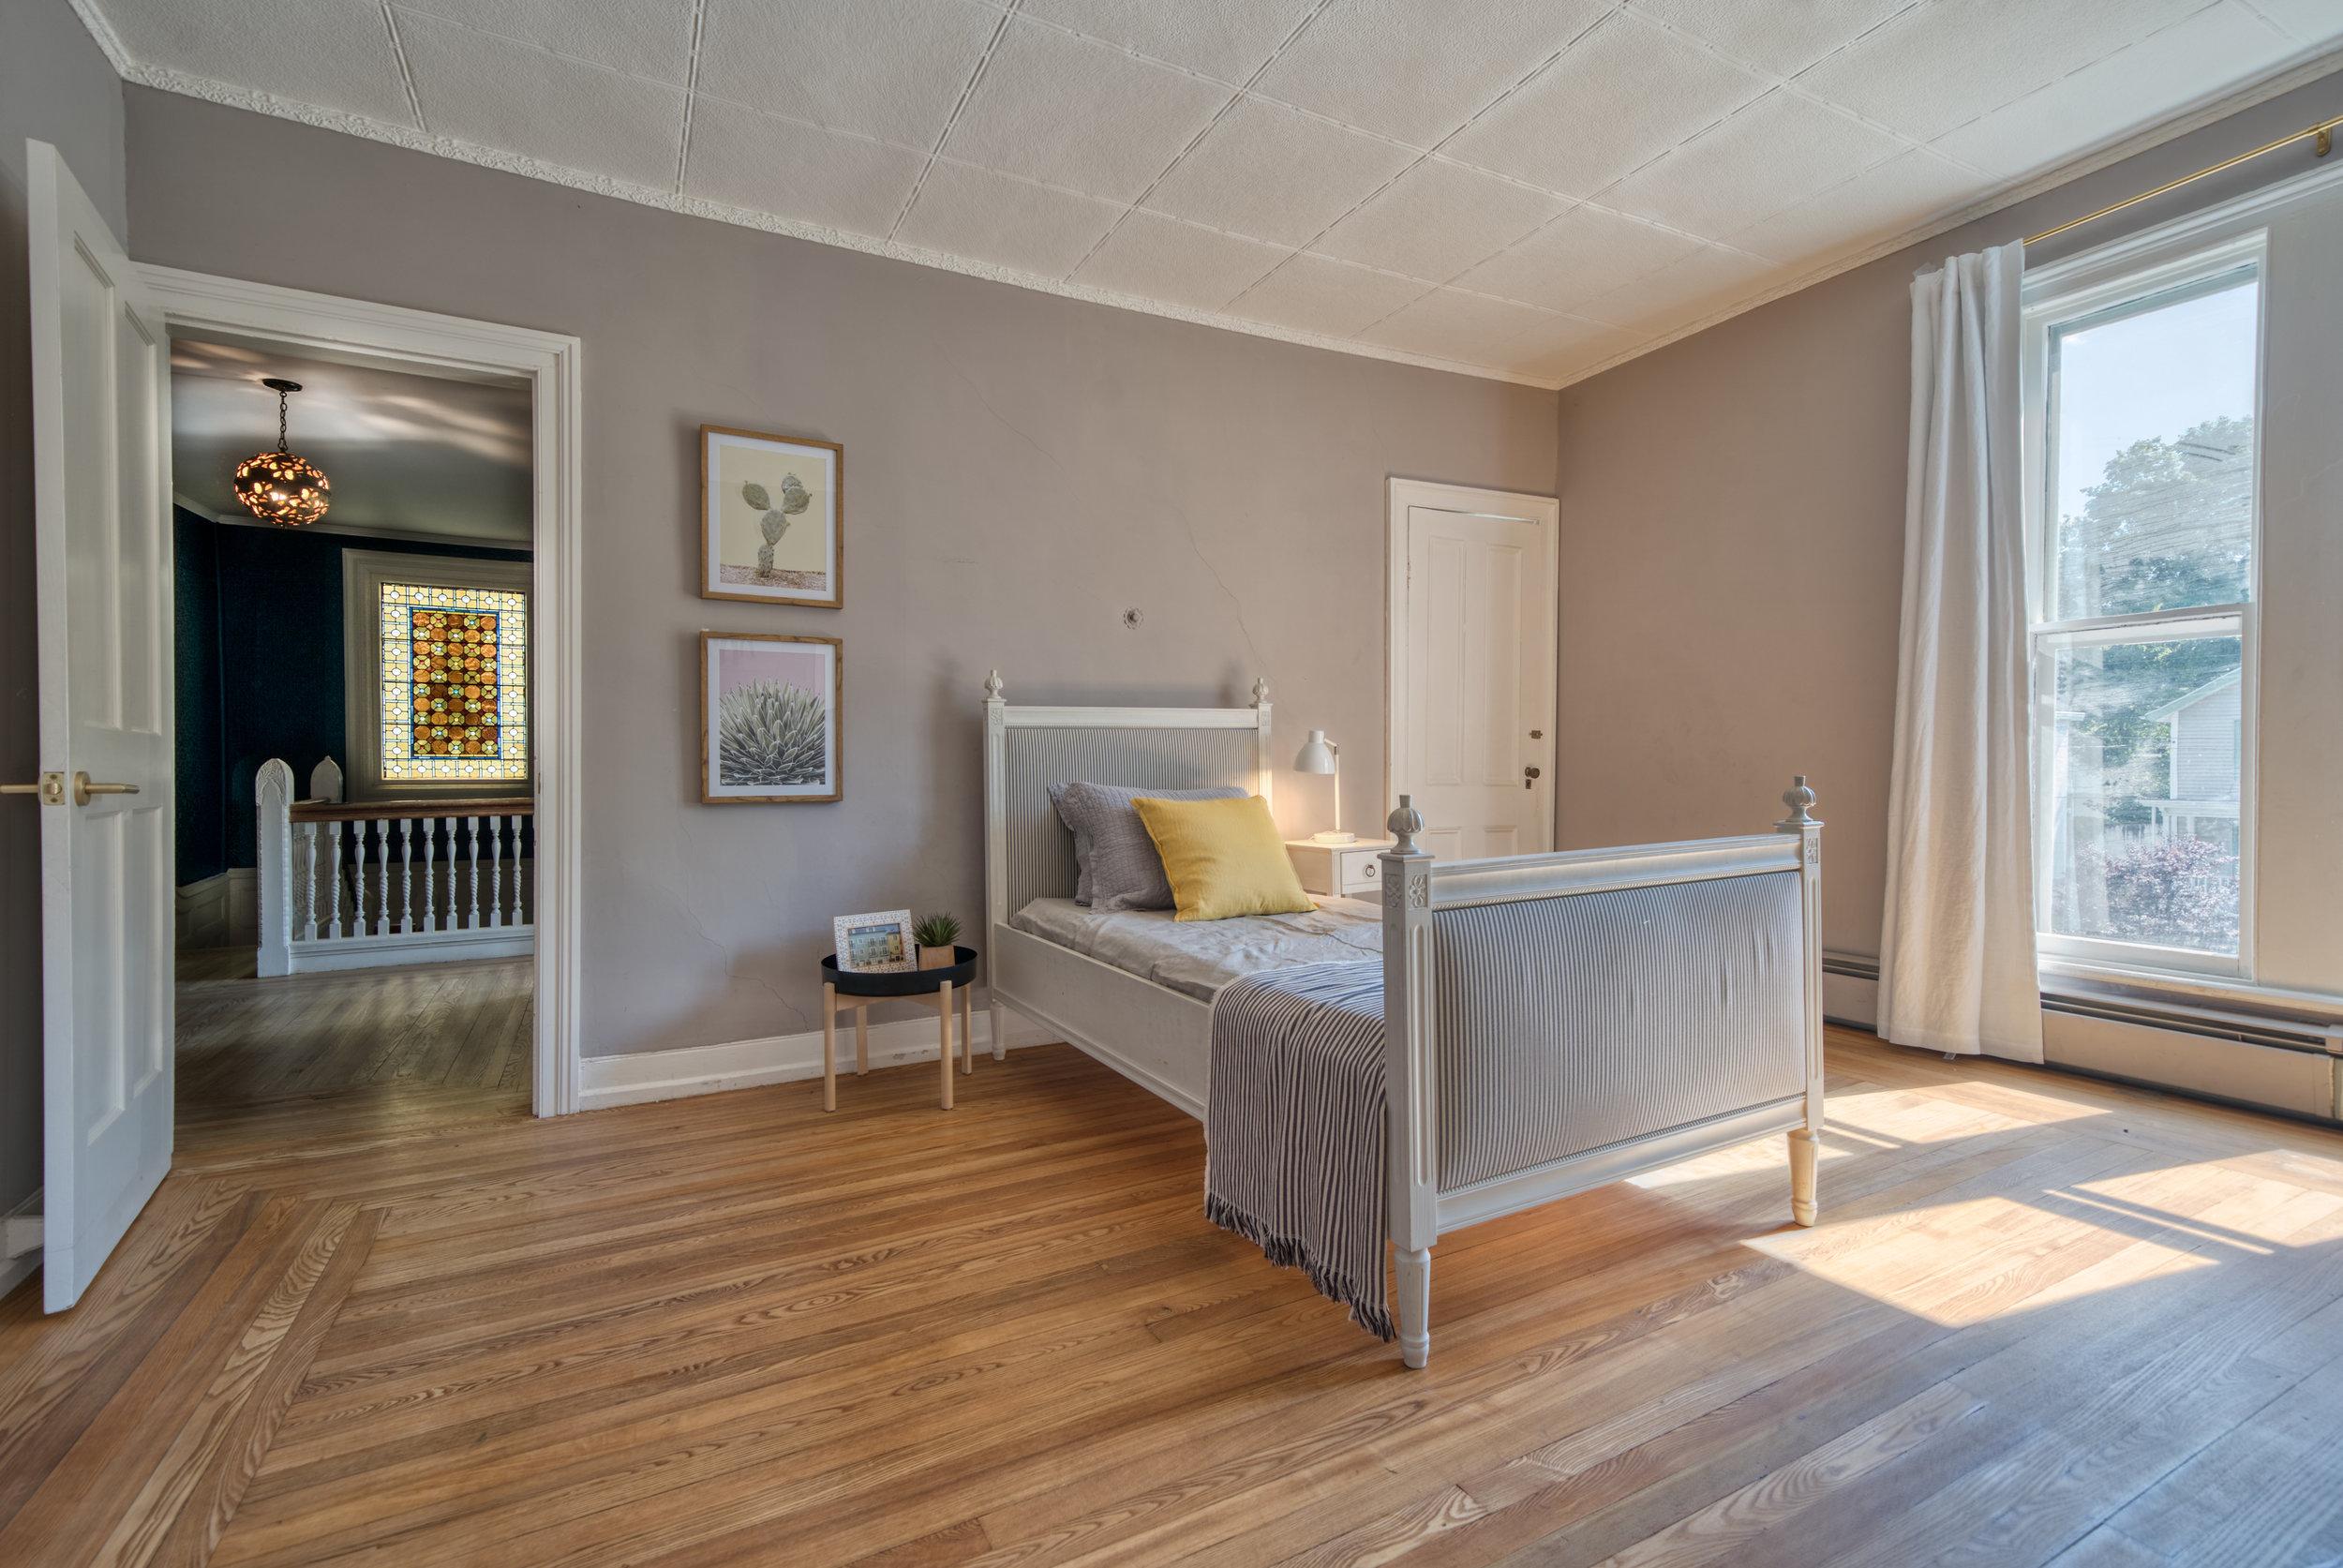 UptownKingston-Guestroom-1.jpg